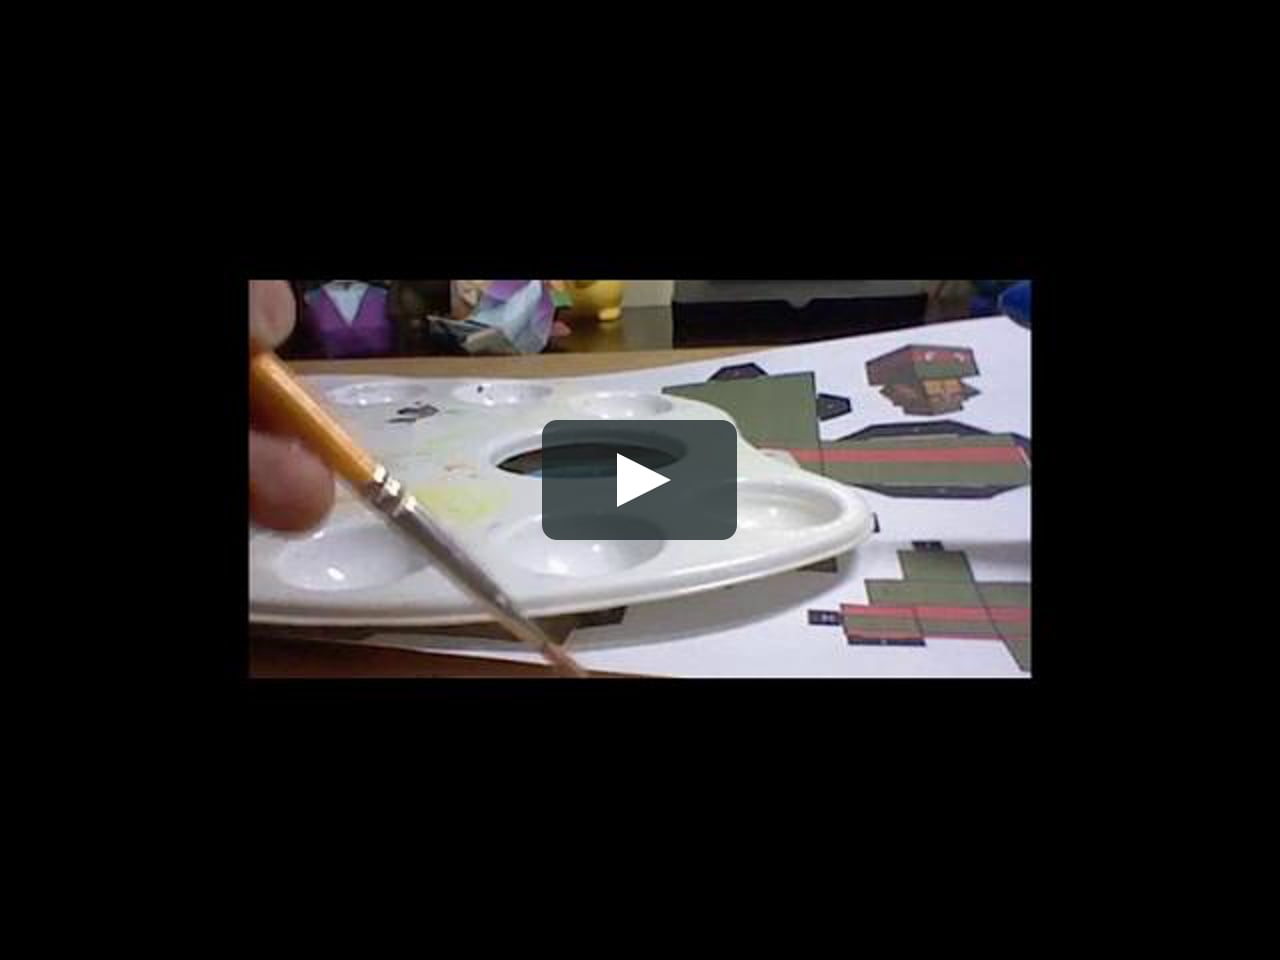 Papercraft Como fazer Papercraft: Vídeo 01: Cubecraft